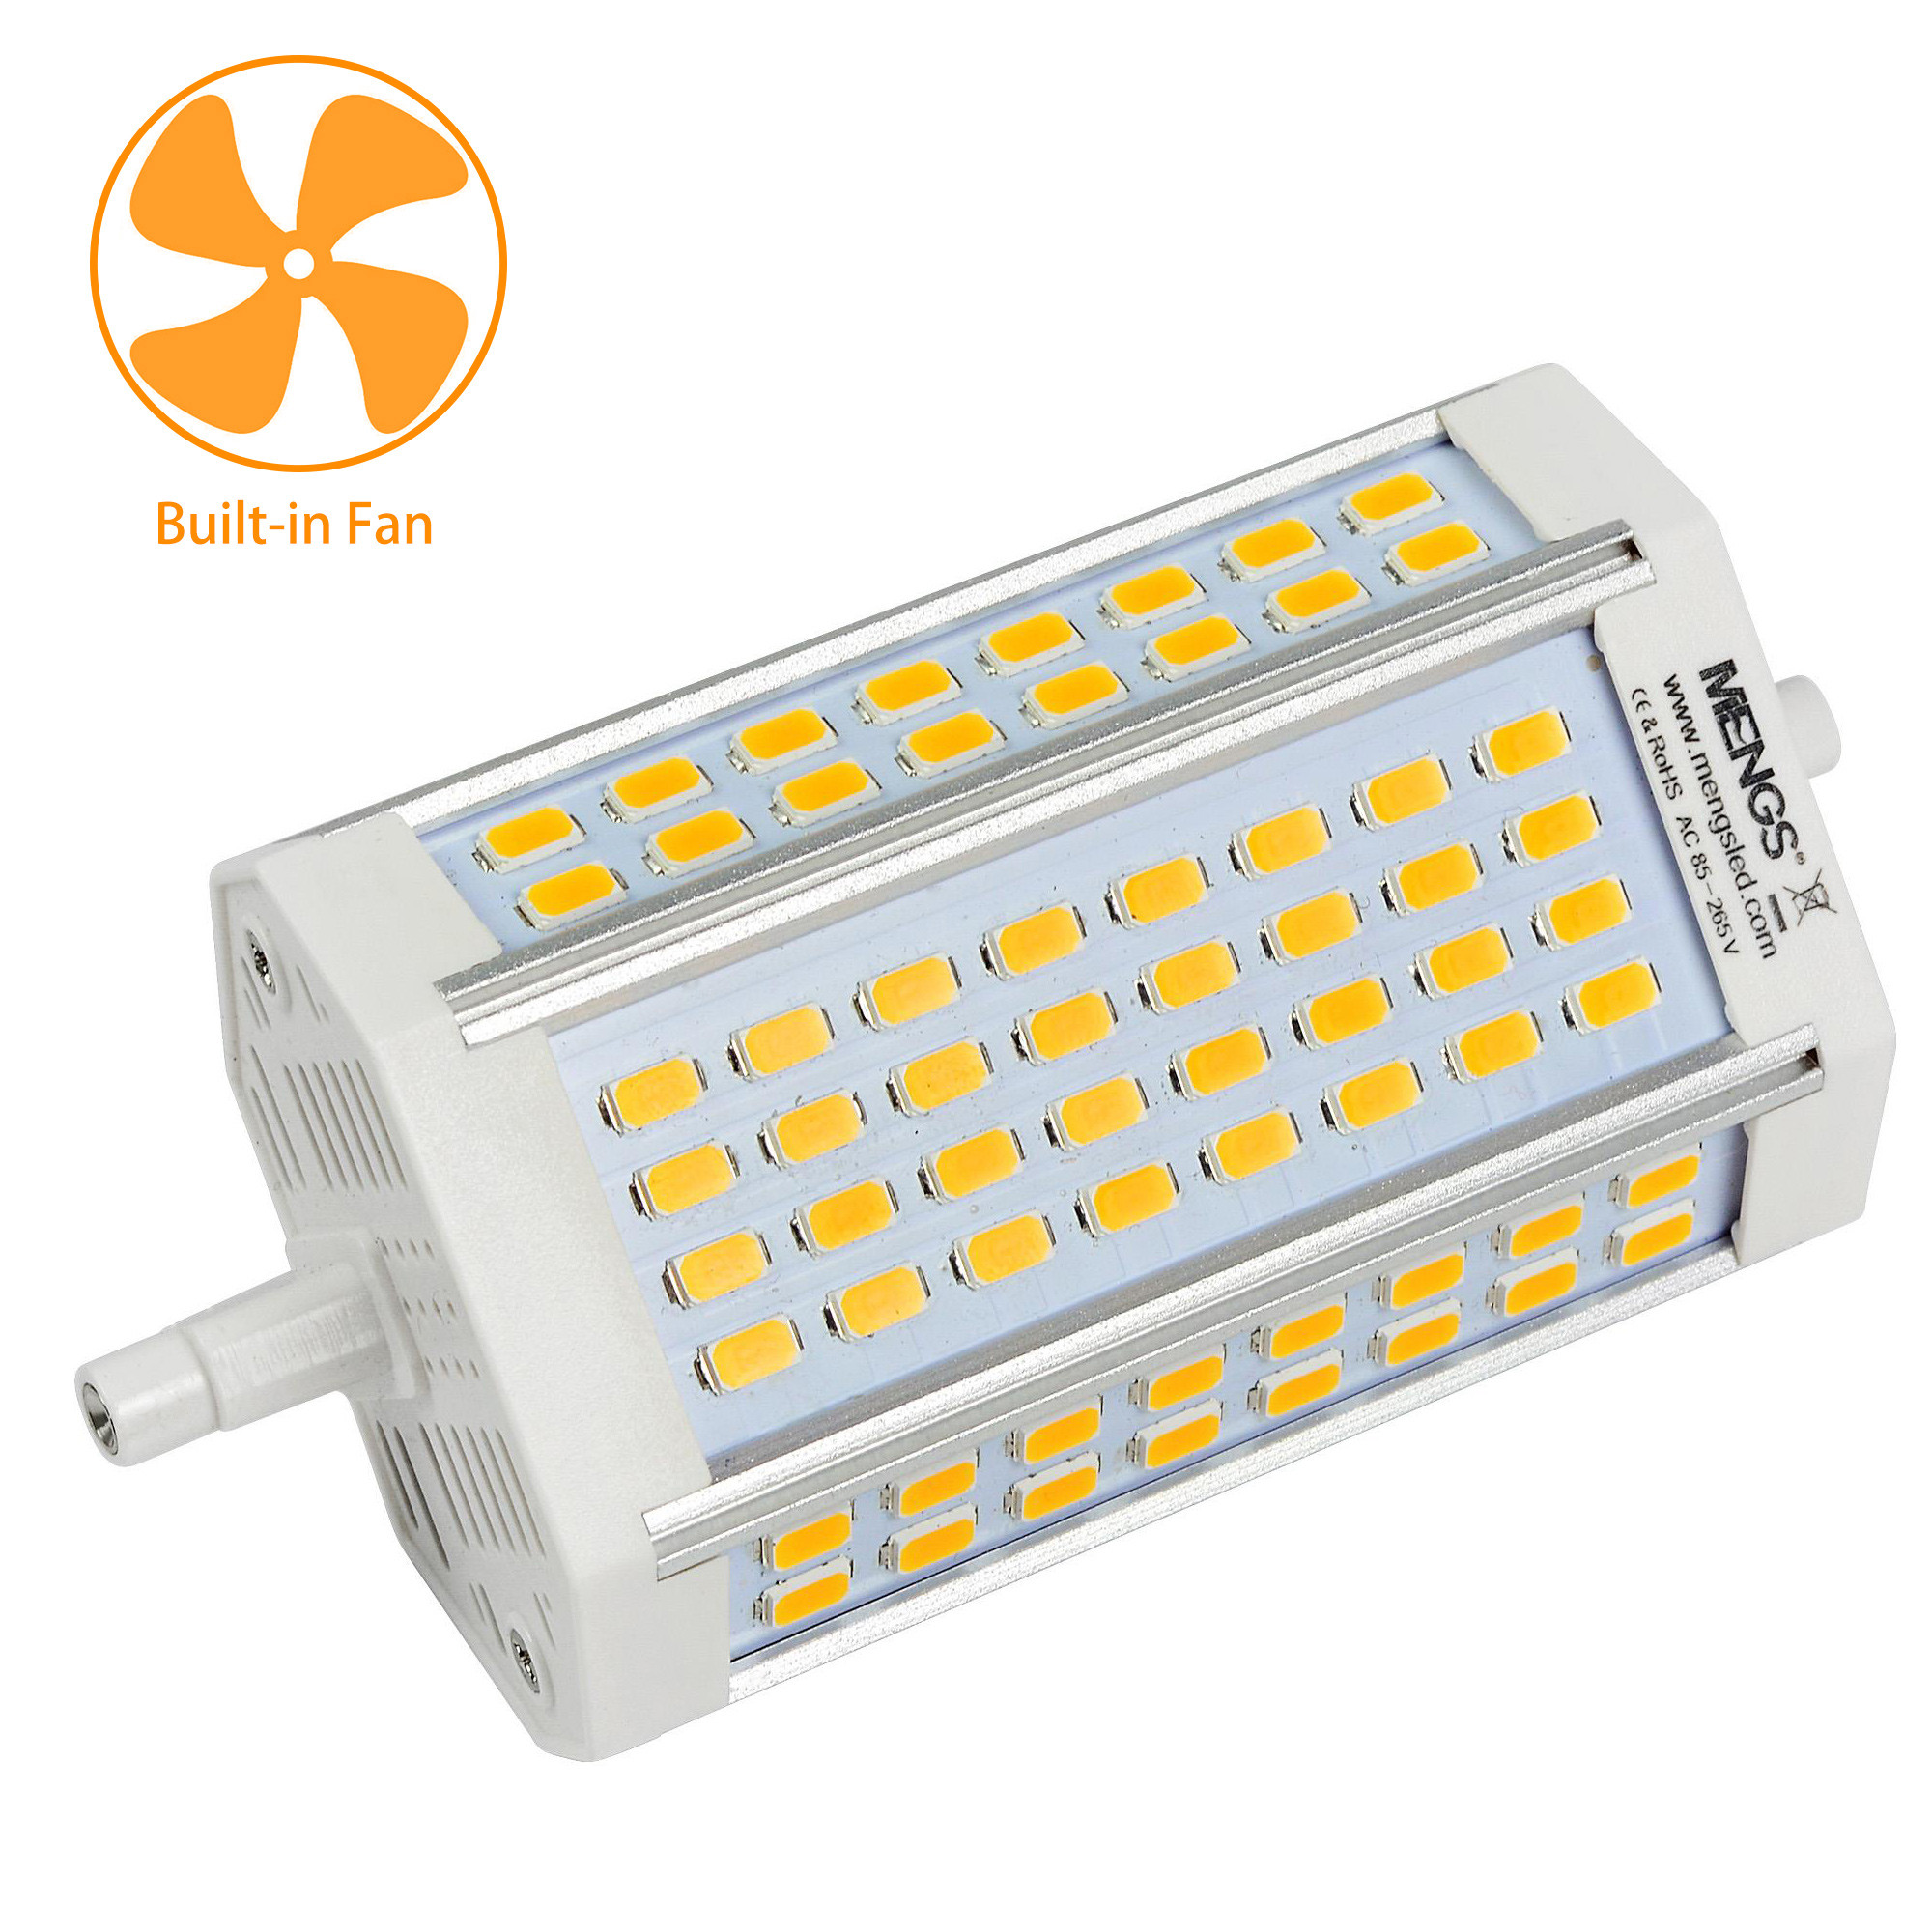 MENGS® R7s 30W LED Flood Light 64x 5730 SMD With Cooling Fan LED Bulb Lamp AC 85-265V In Cool White Energy-Saving Light